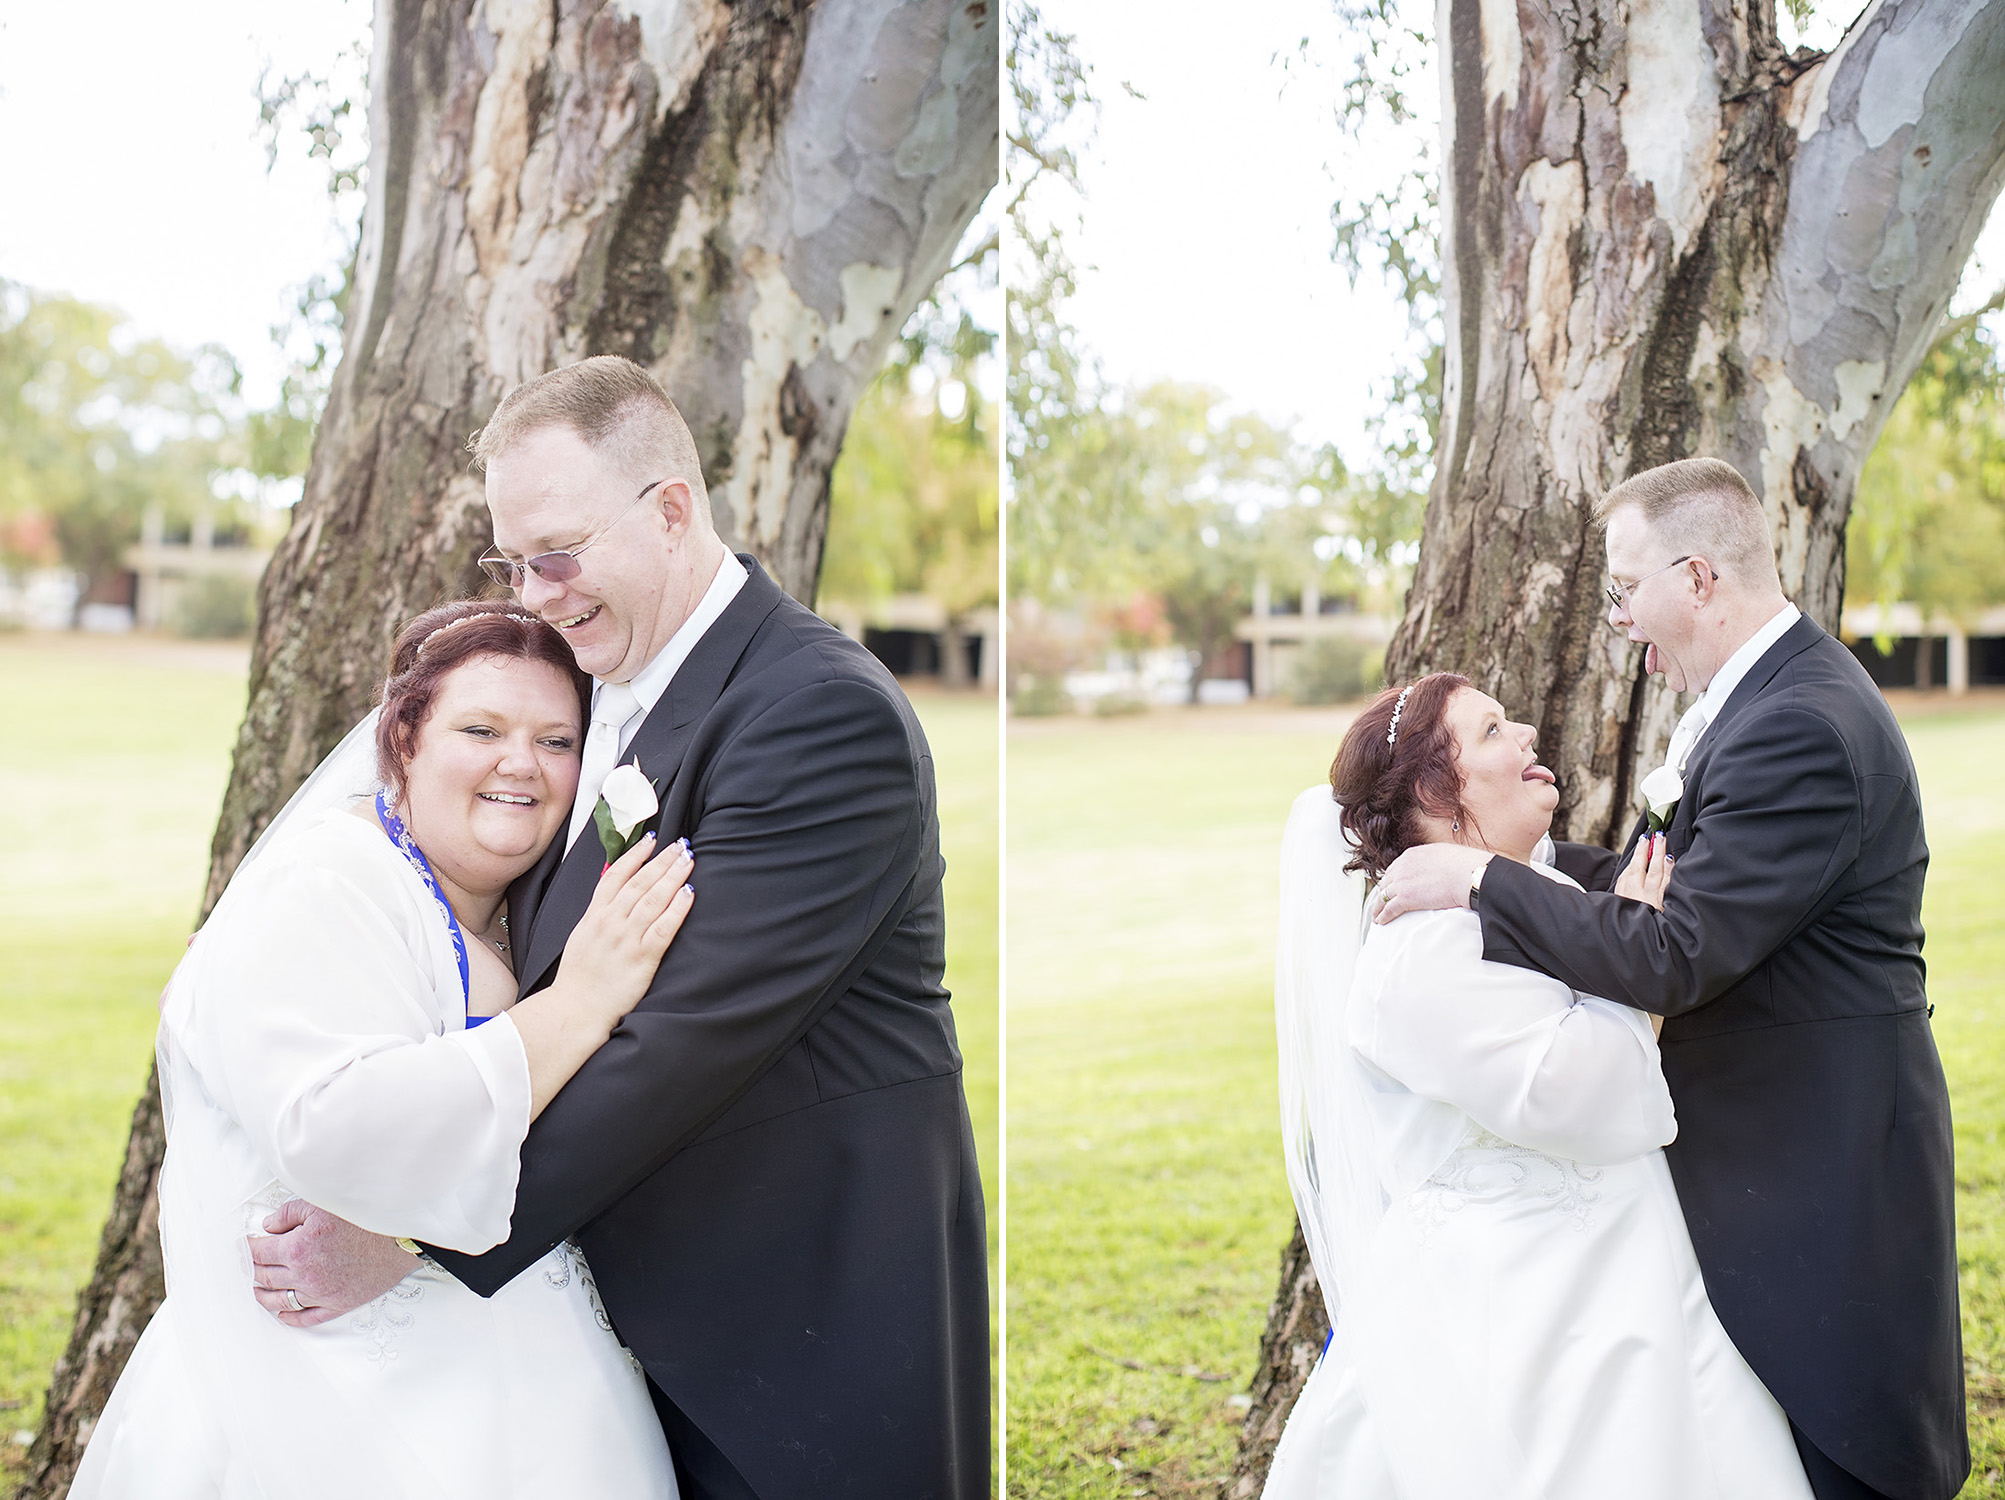 Sferas Modbury wedding 25.jpg